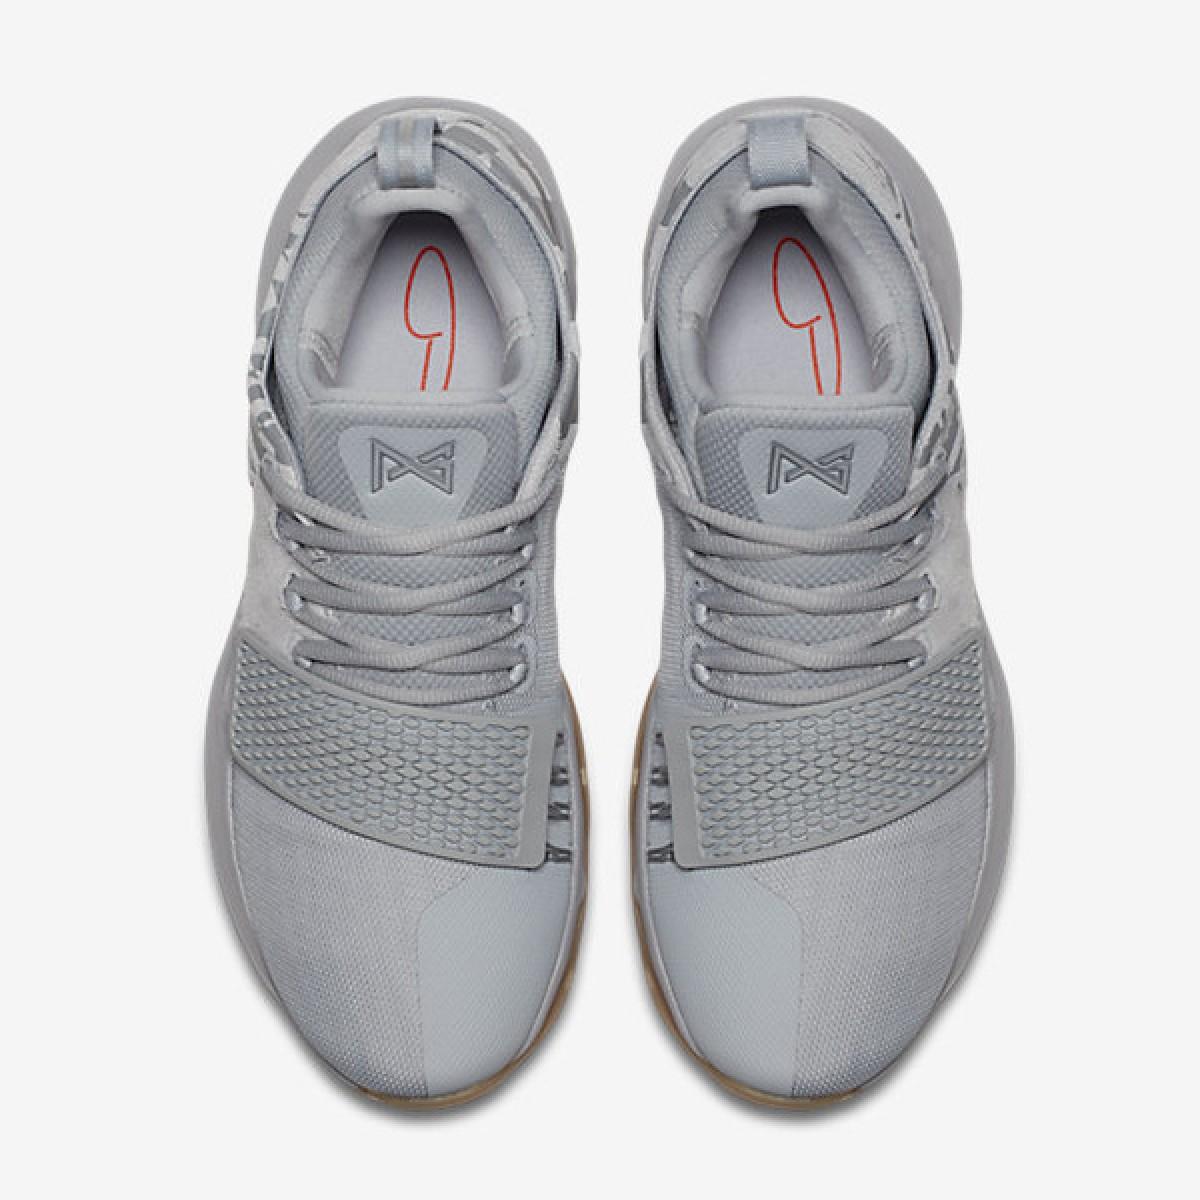 8a8cd073352a Buy Nike PG 1  Baseline  Basketball shoes   sneakers